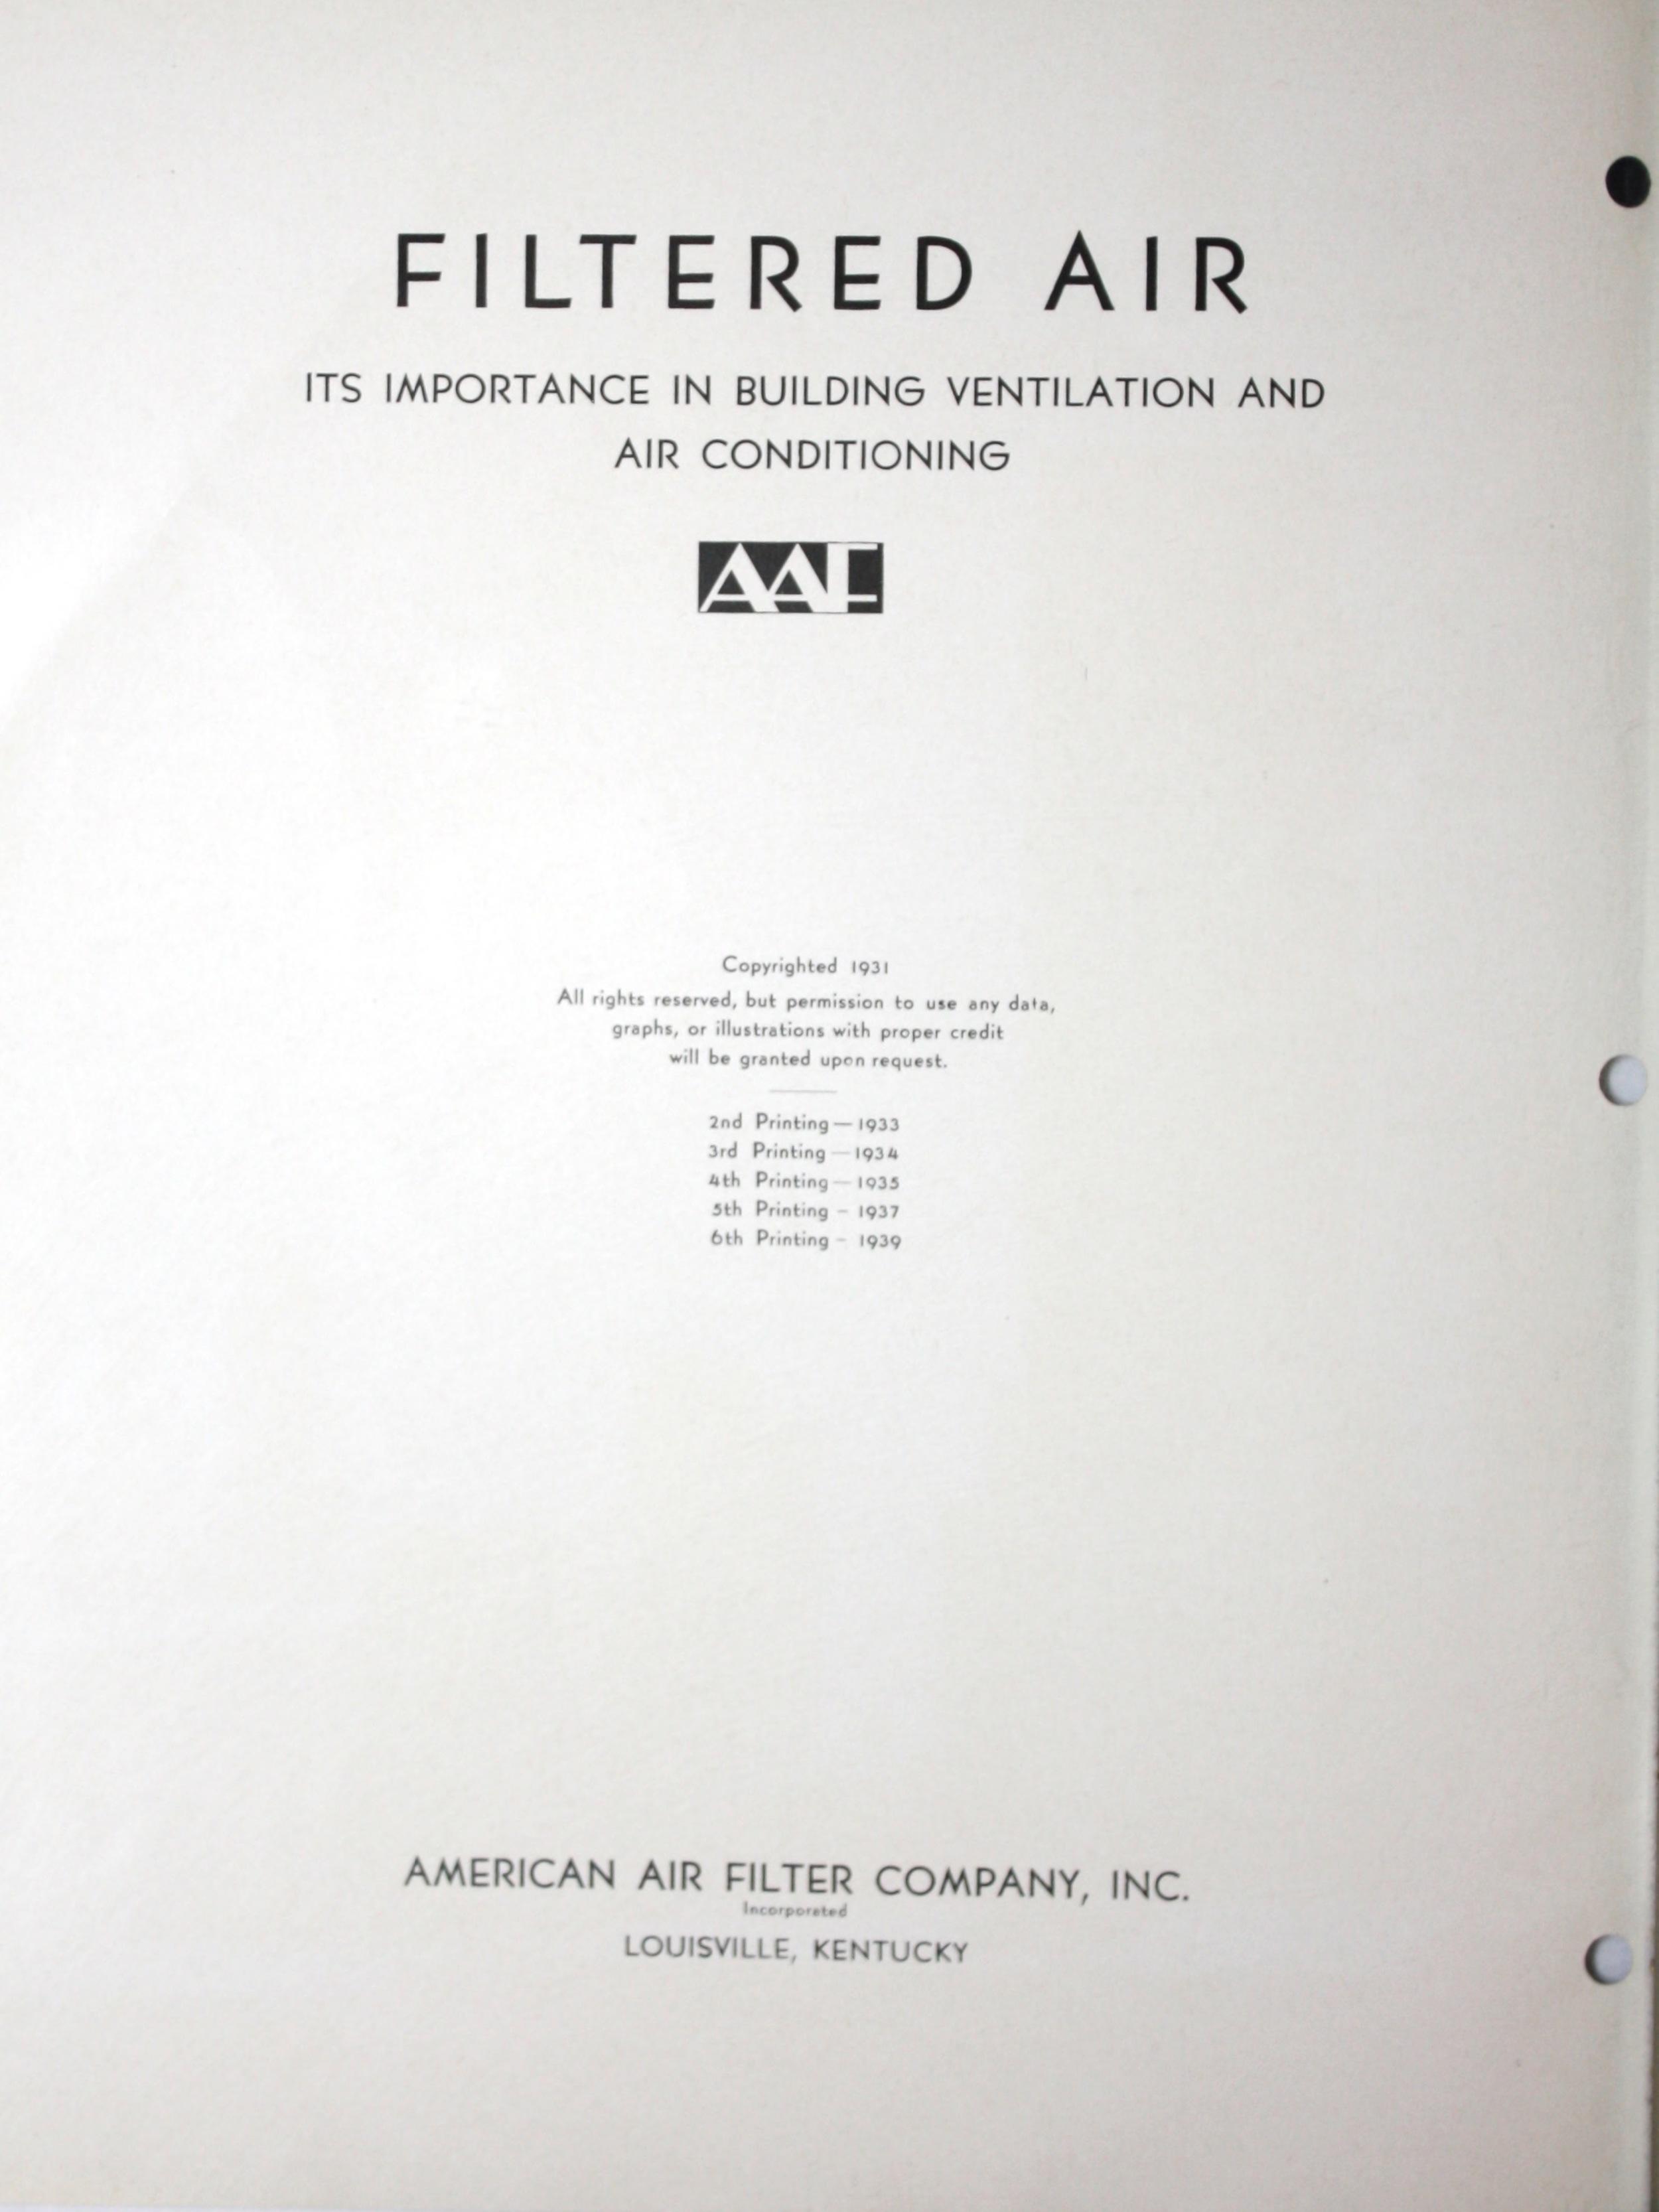 AmericanAirFilterCoInc-Cca43036_0001.jpg